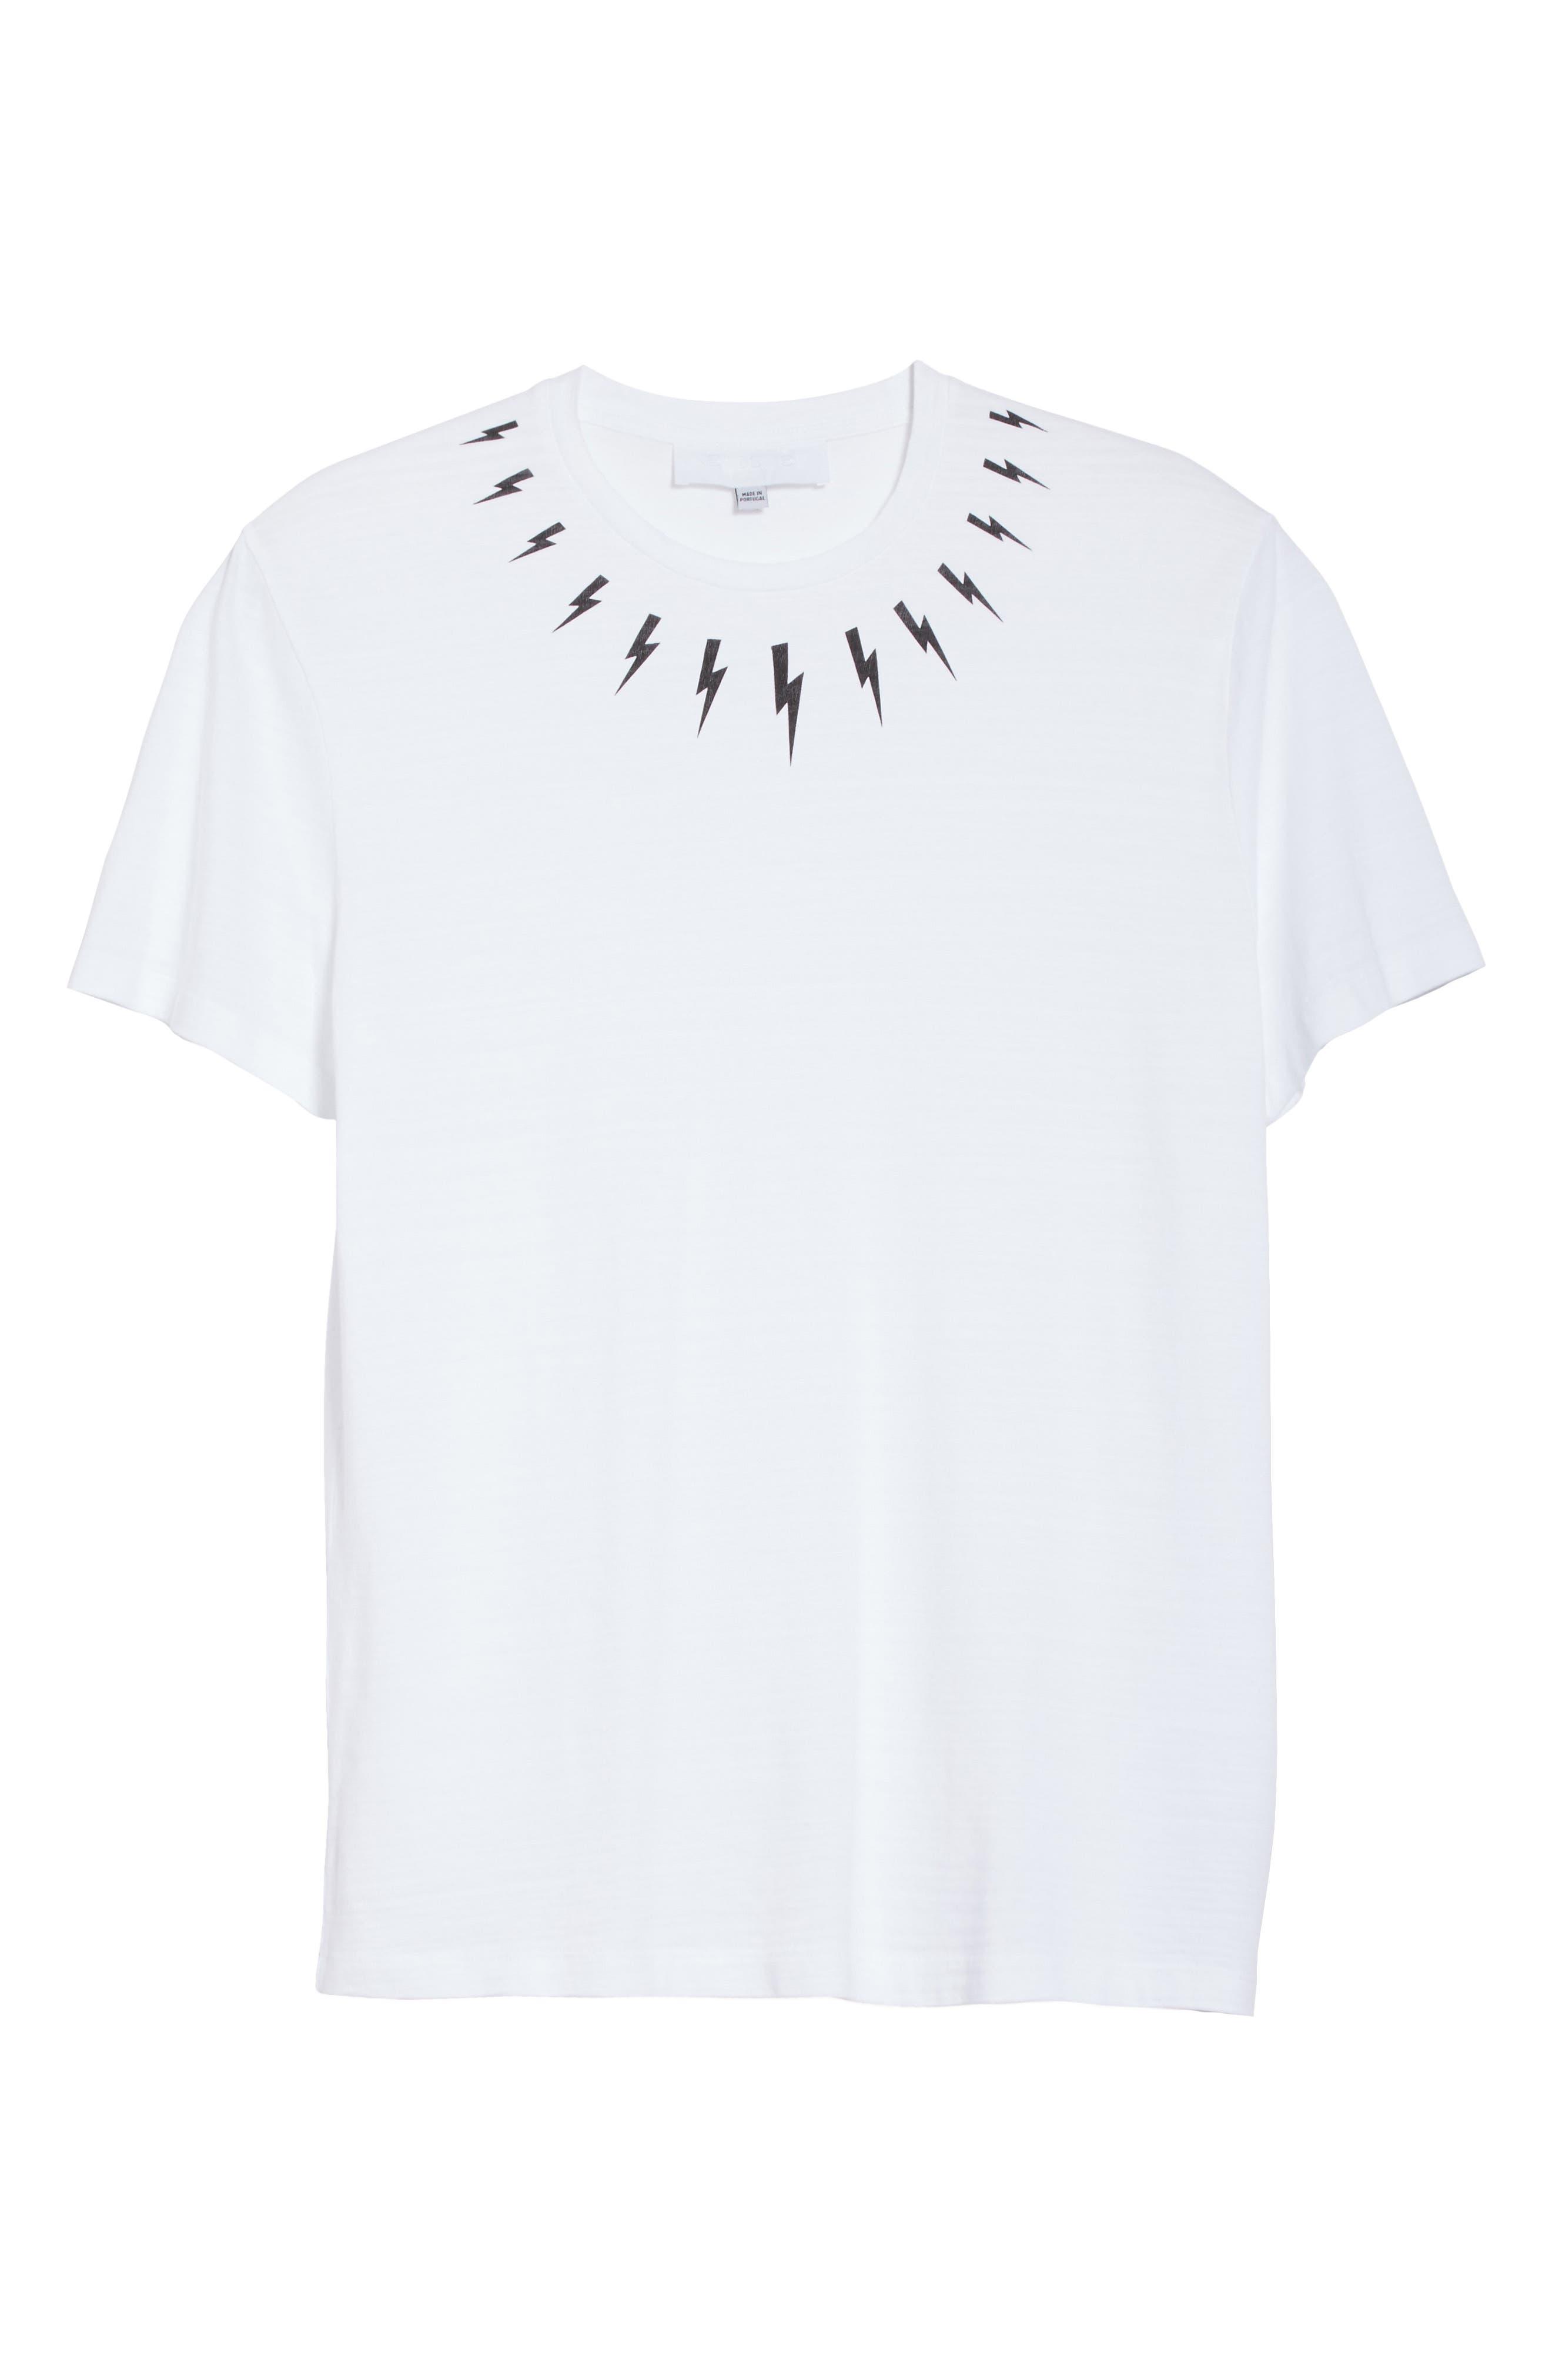 Thunderbolt Graphic T-Shirt,                             Alternate thumbnail 6, color,                             100